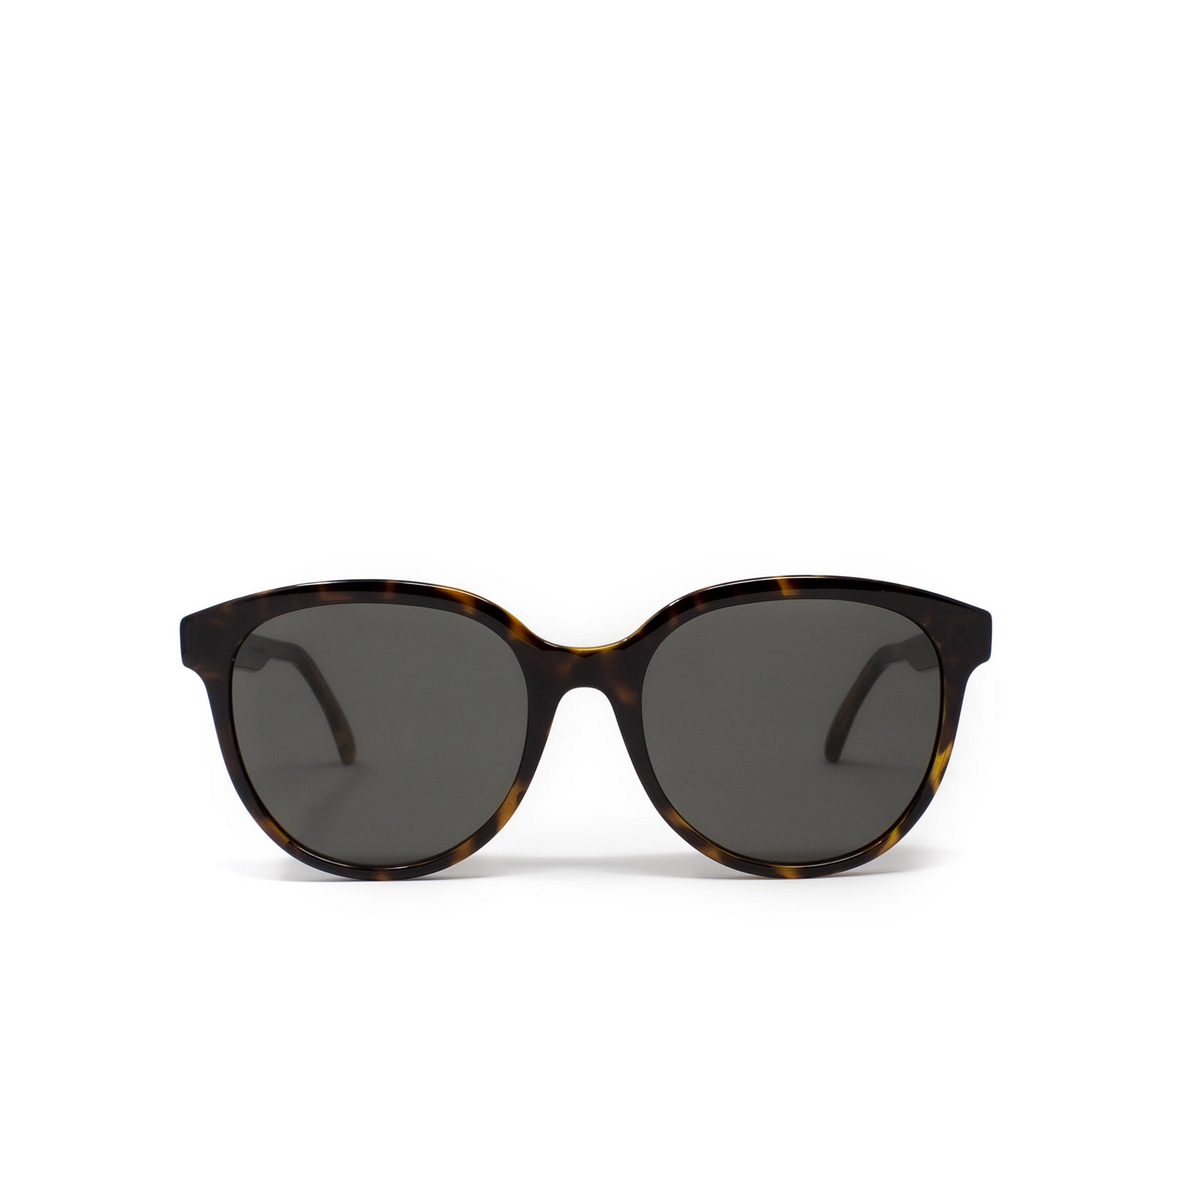 Saint Laurent® Round Sunglasses: SL 317 color Havana 002 - 1/3.